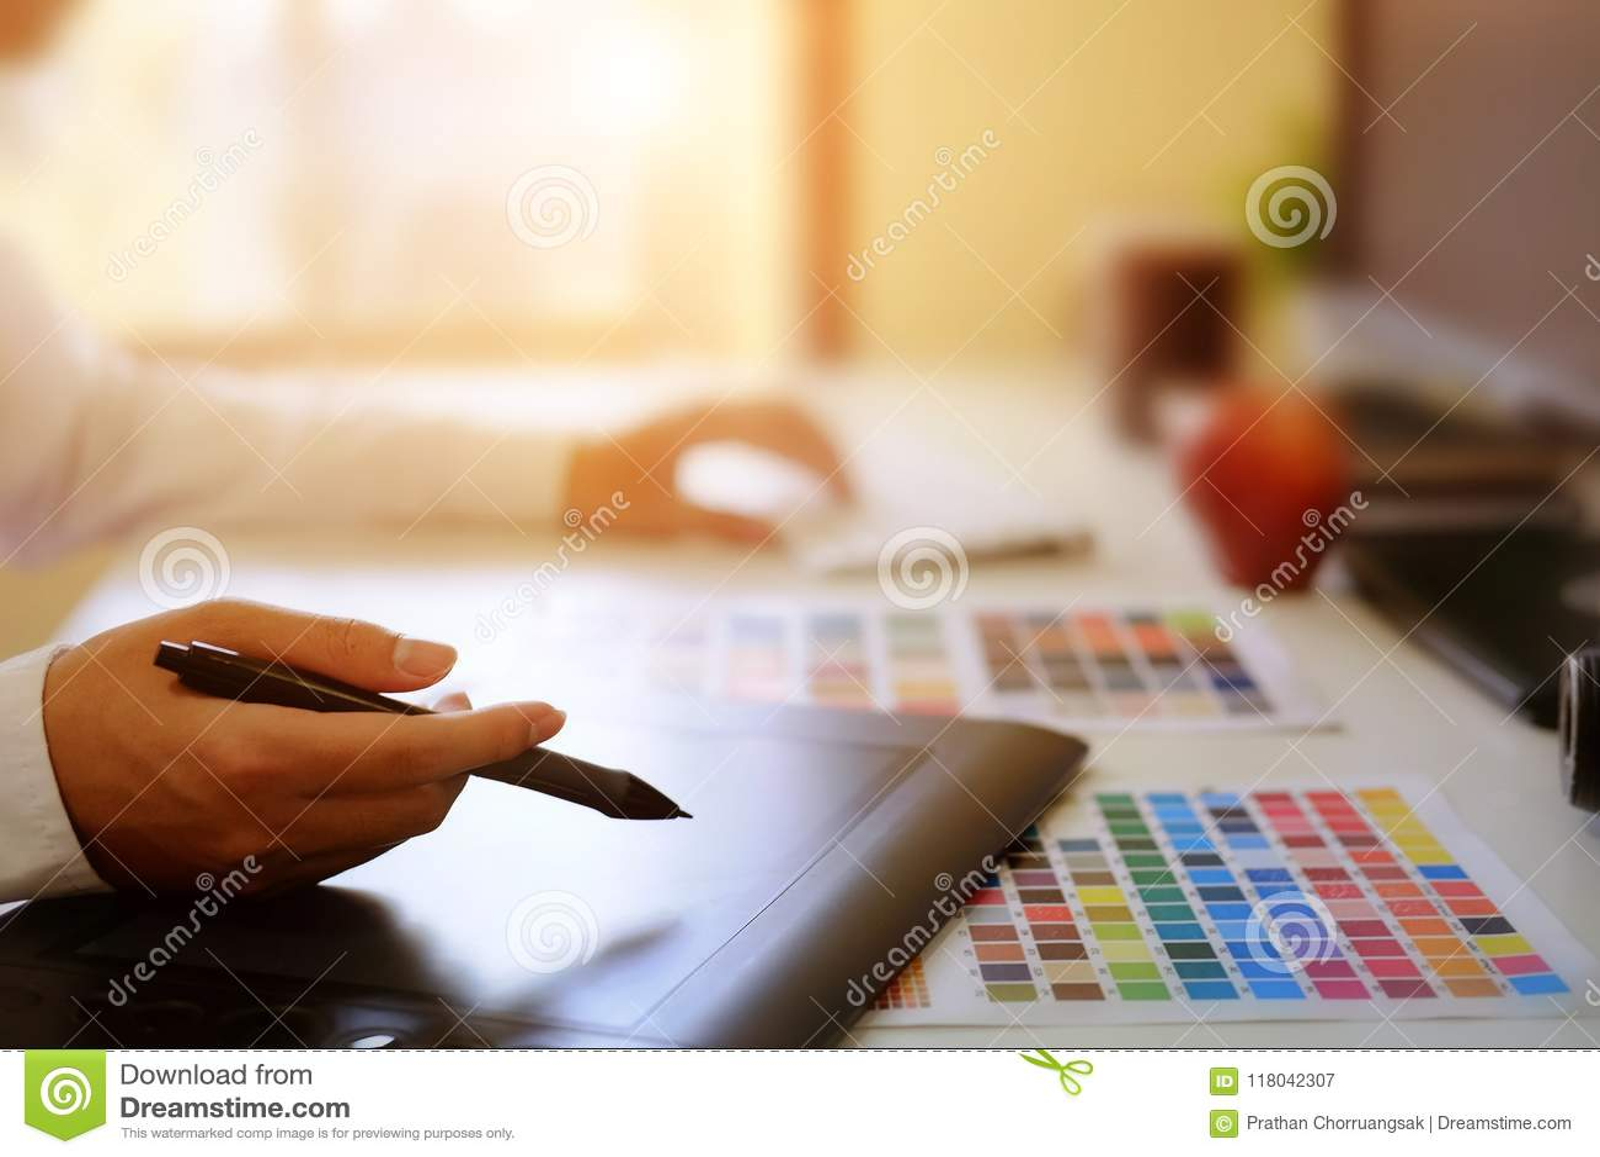 Graphic designer hands using digital tablet and computer.